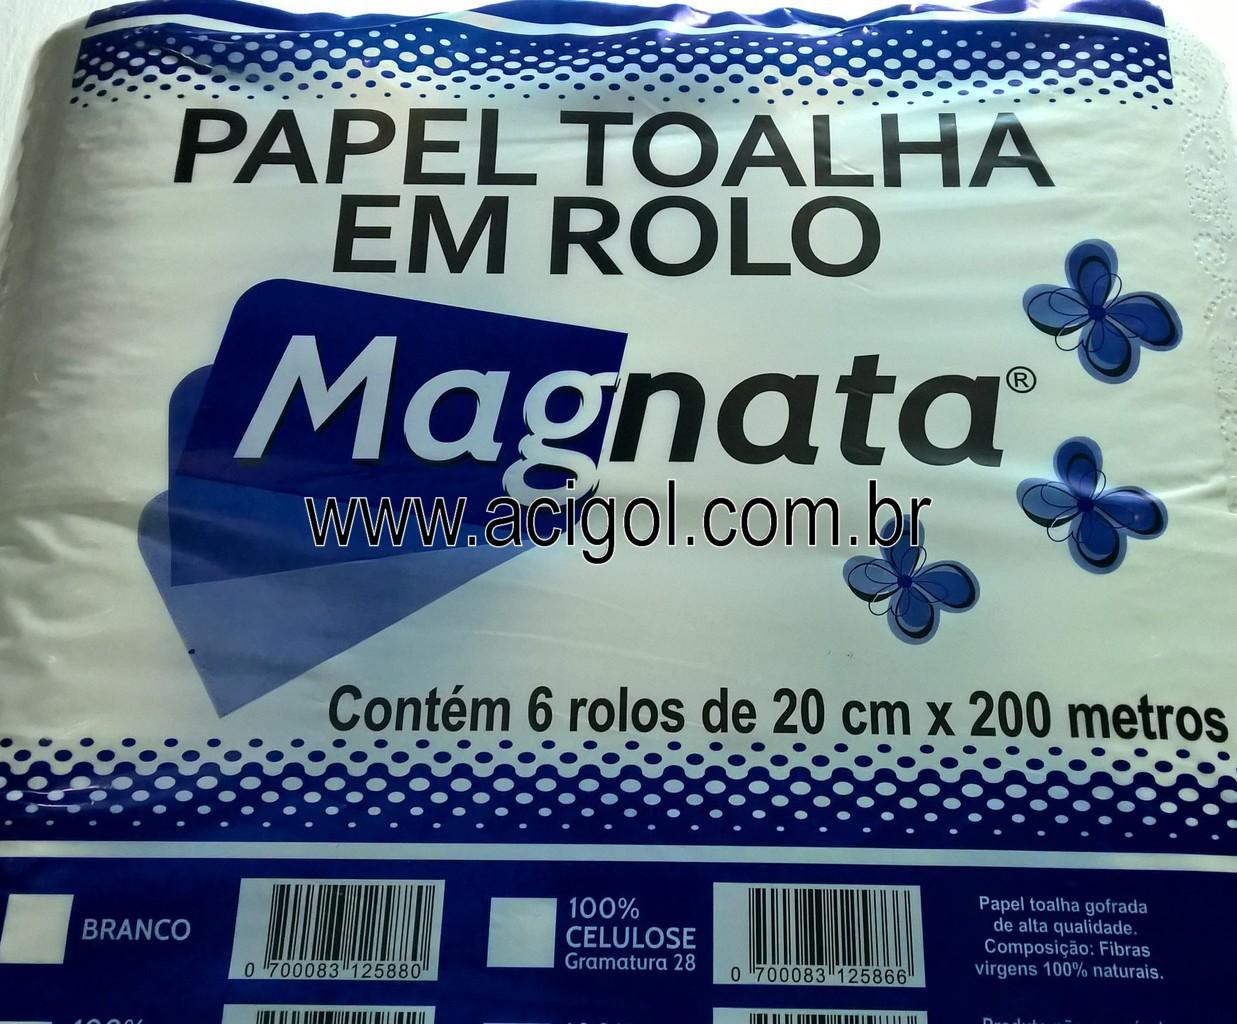 PAPEL TOALHA BOBINA MAGNATA 6X200M-WP_20161210_20_10_00_Raw_LI